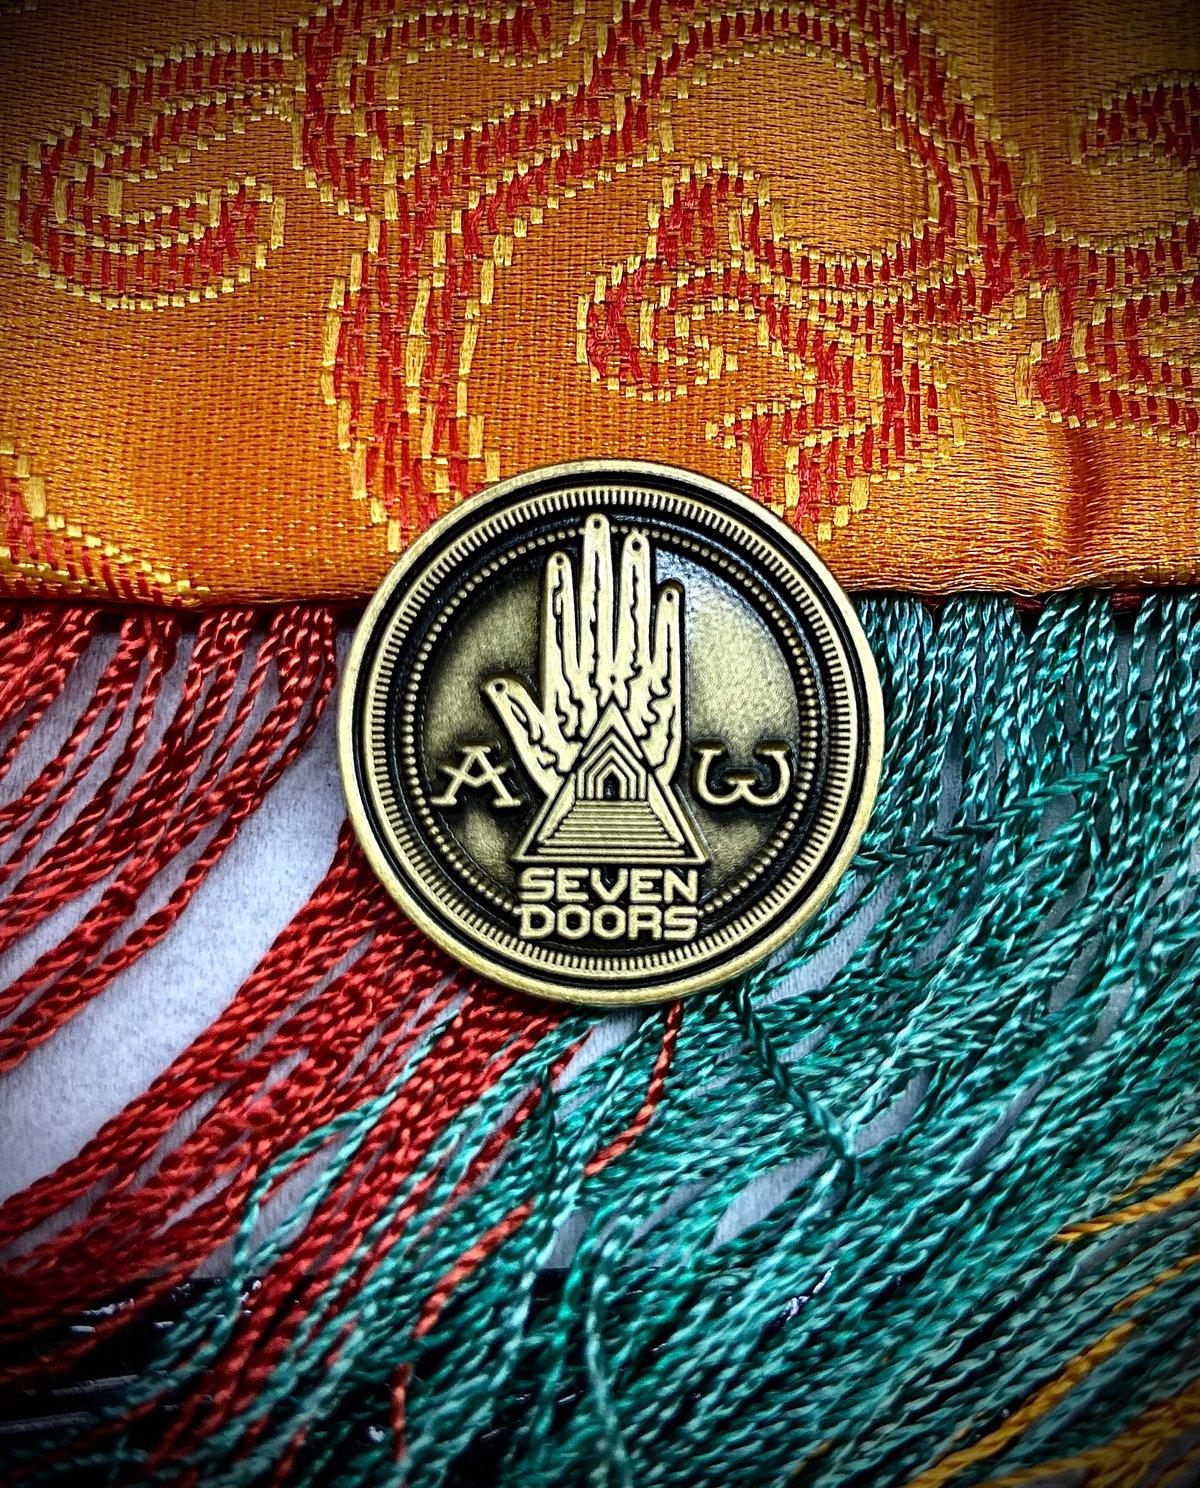 Image of Brass coin voucher